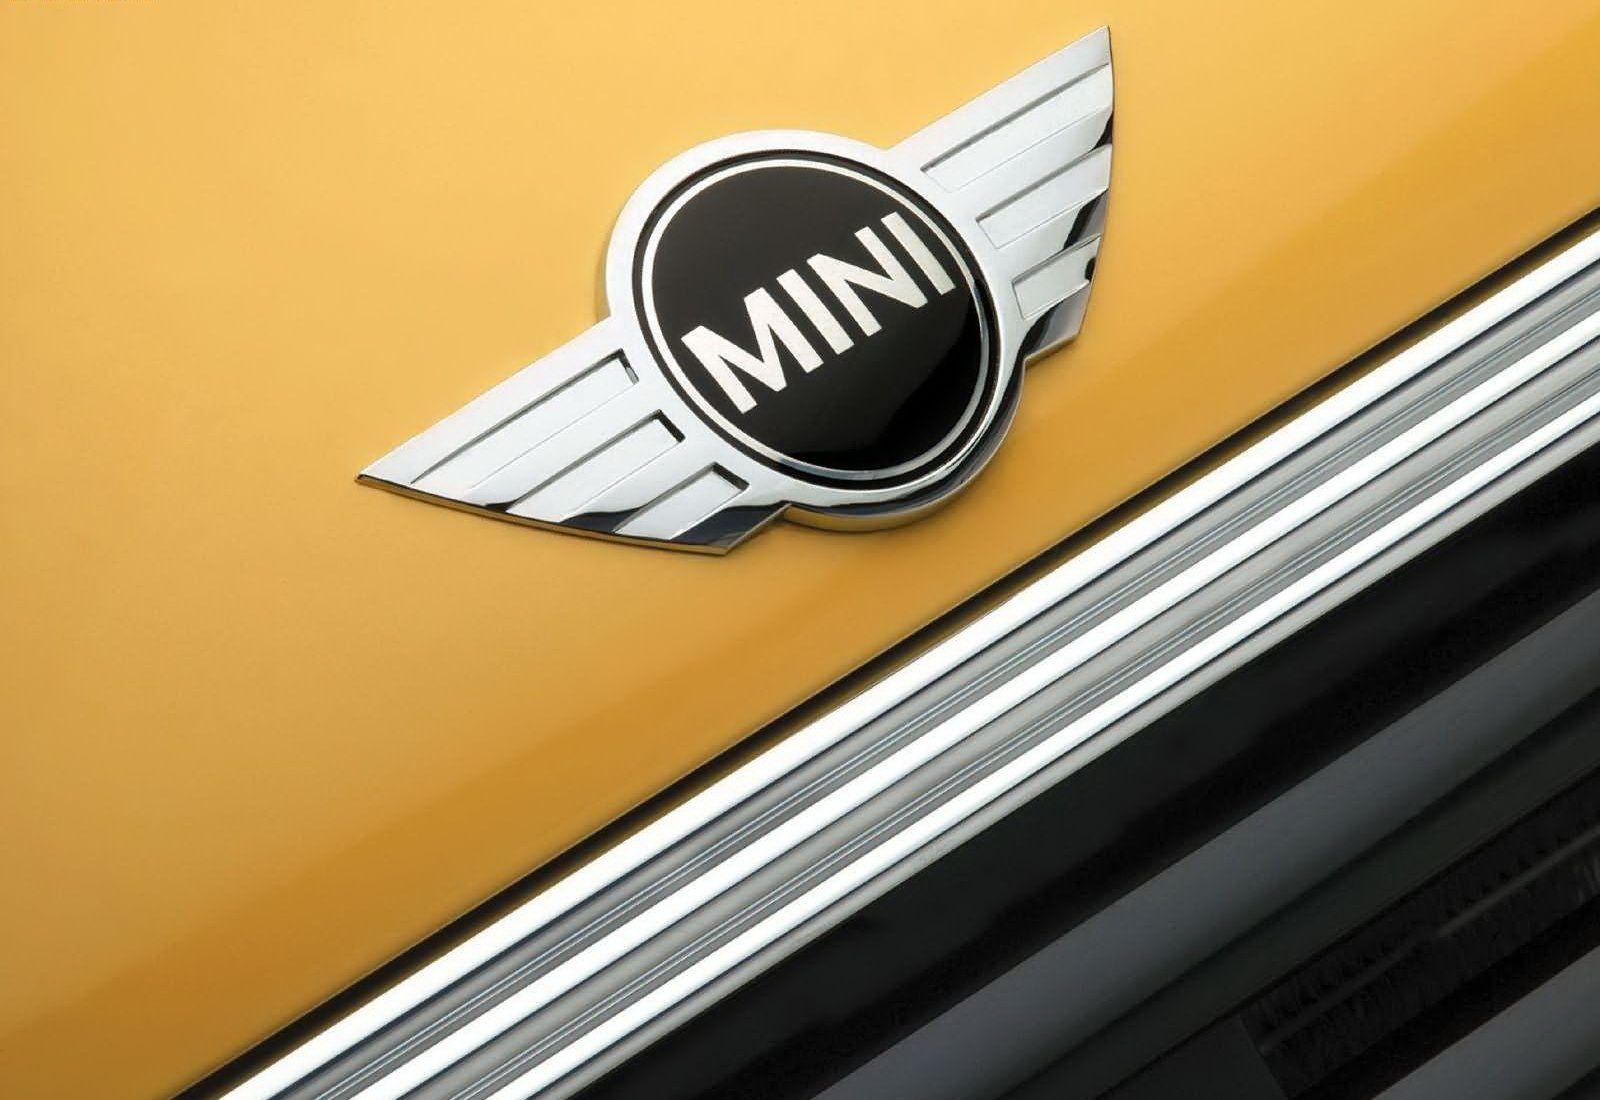 Mini Cooper Logo Mini Car Symbol Meaning And History Car Brand Names Com Mini Cooper Mini Mini Cars